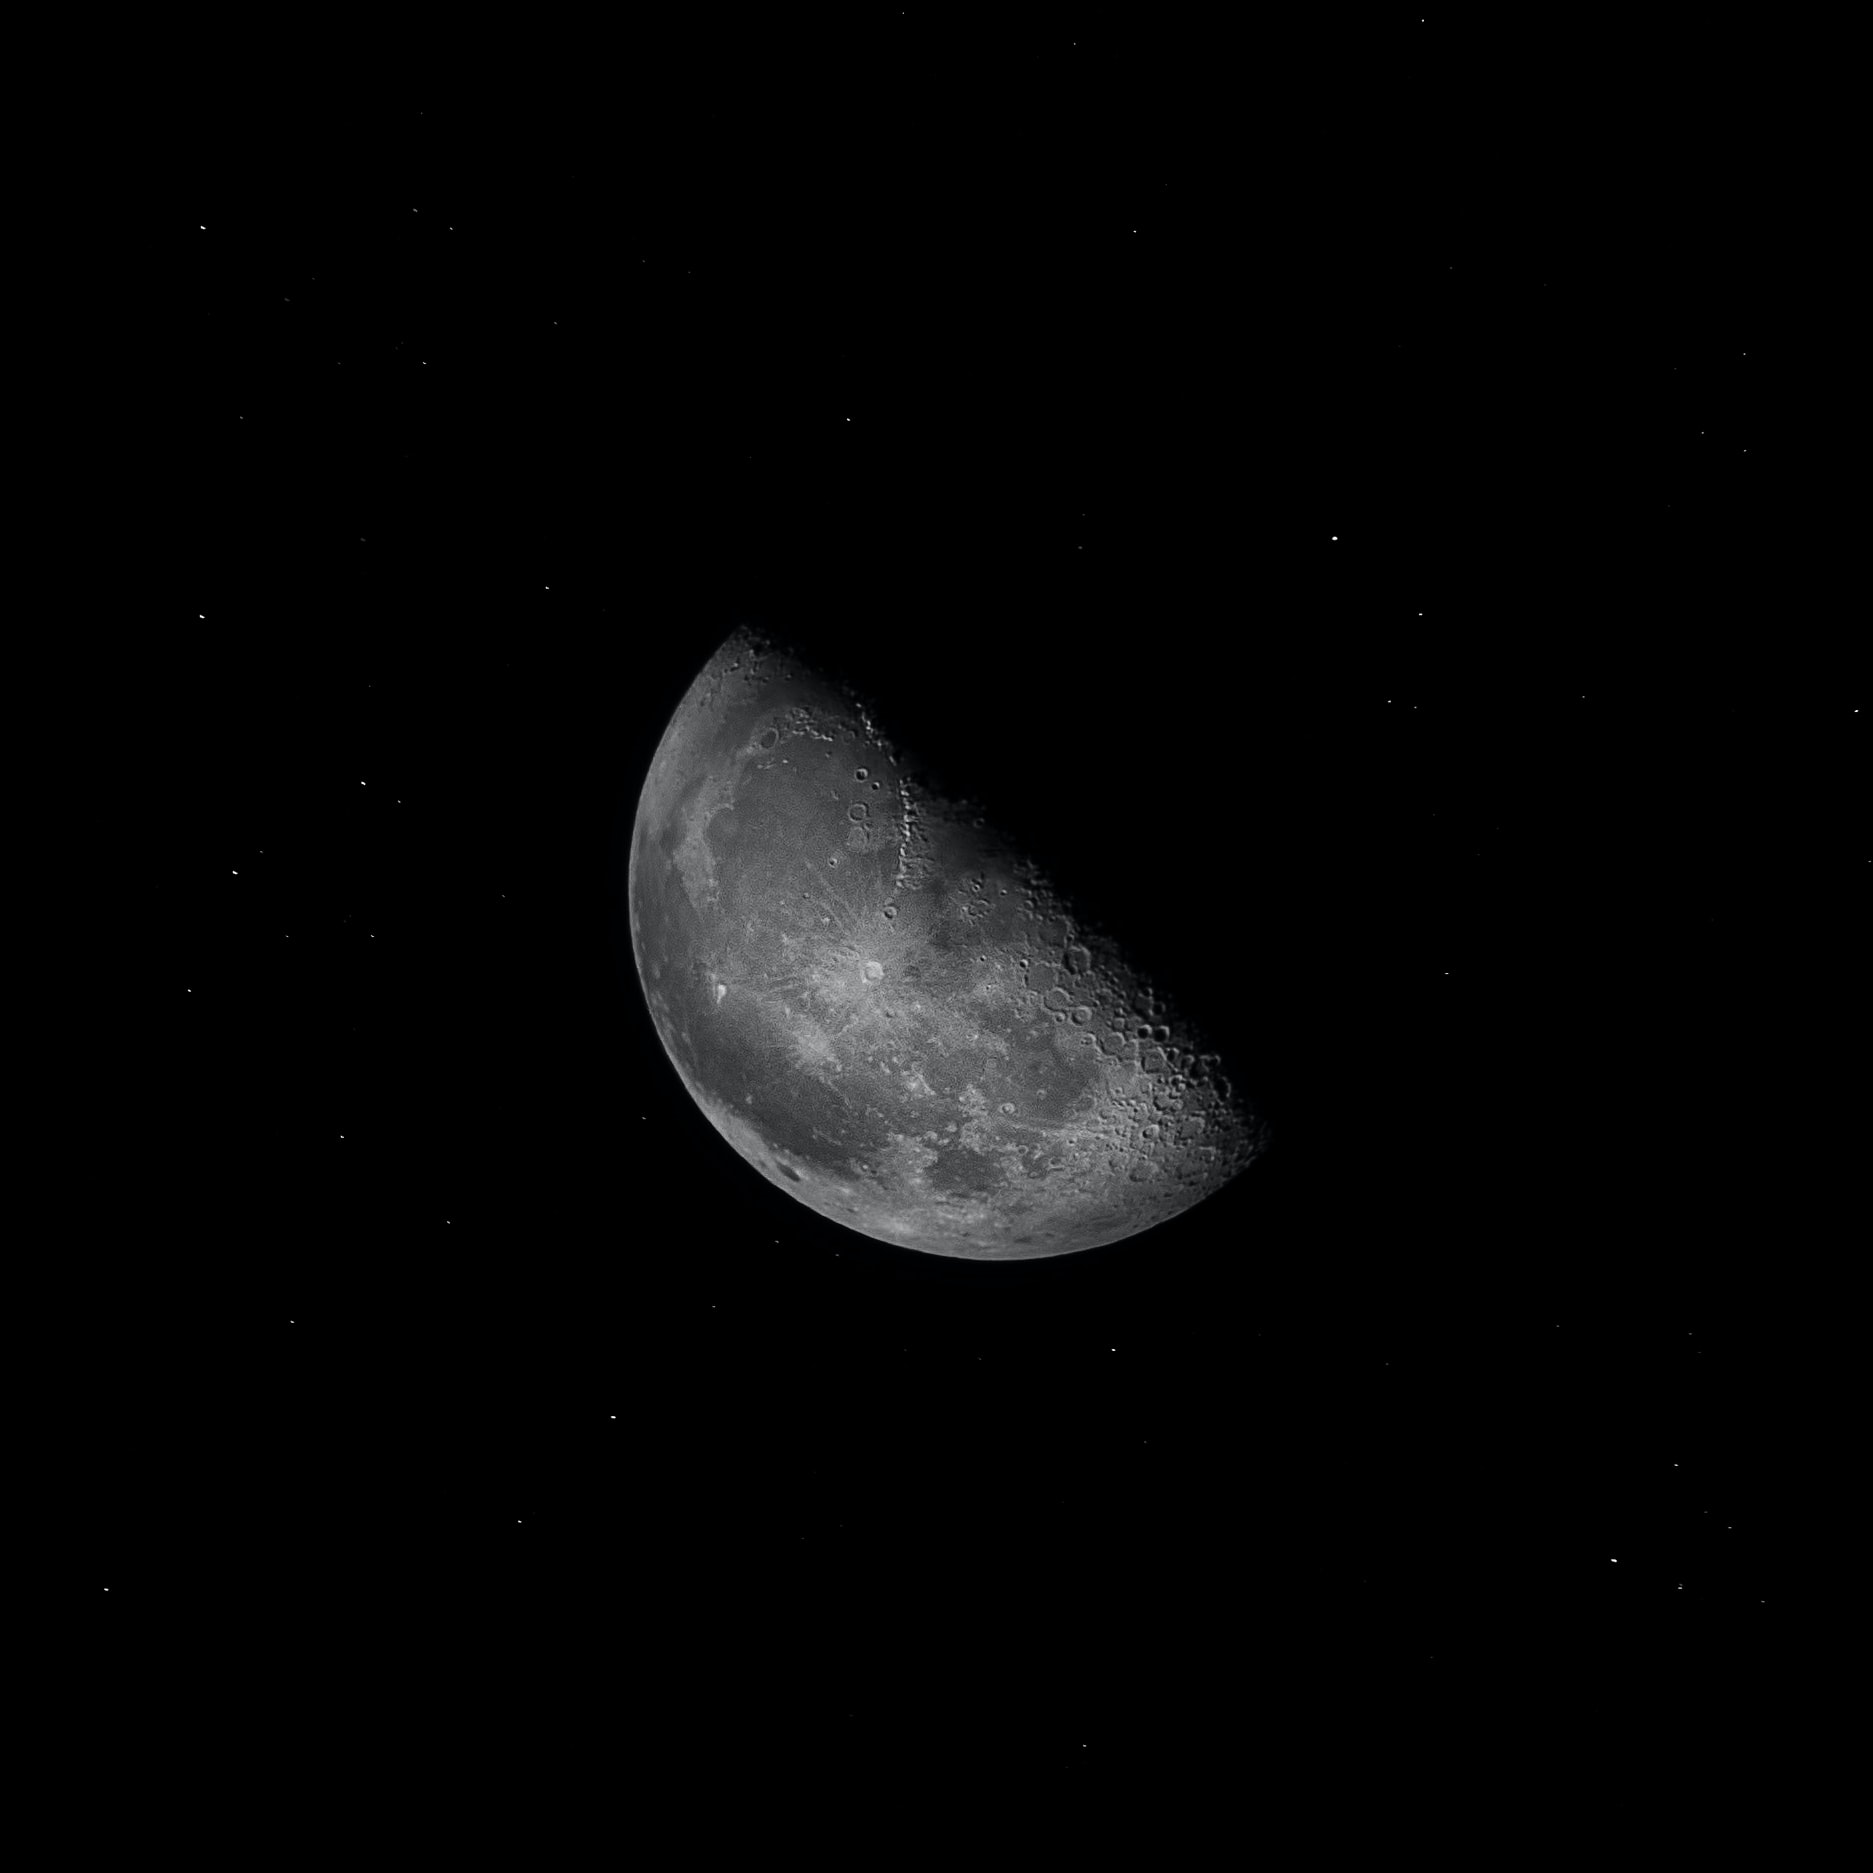 gray planet